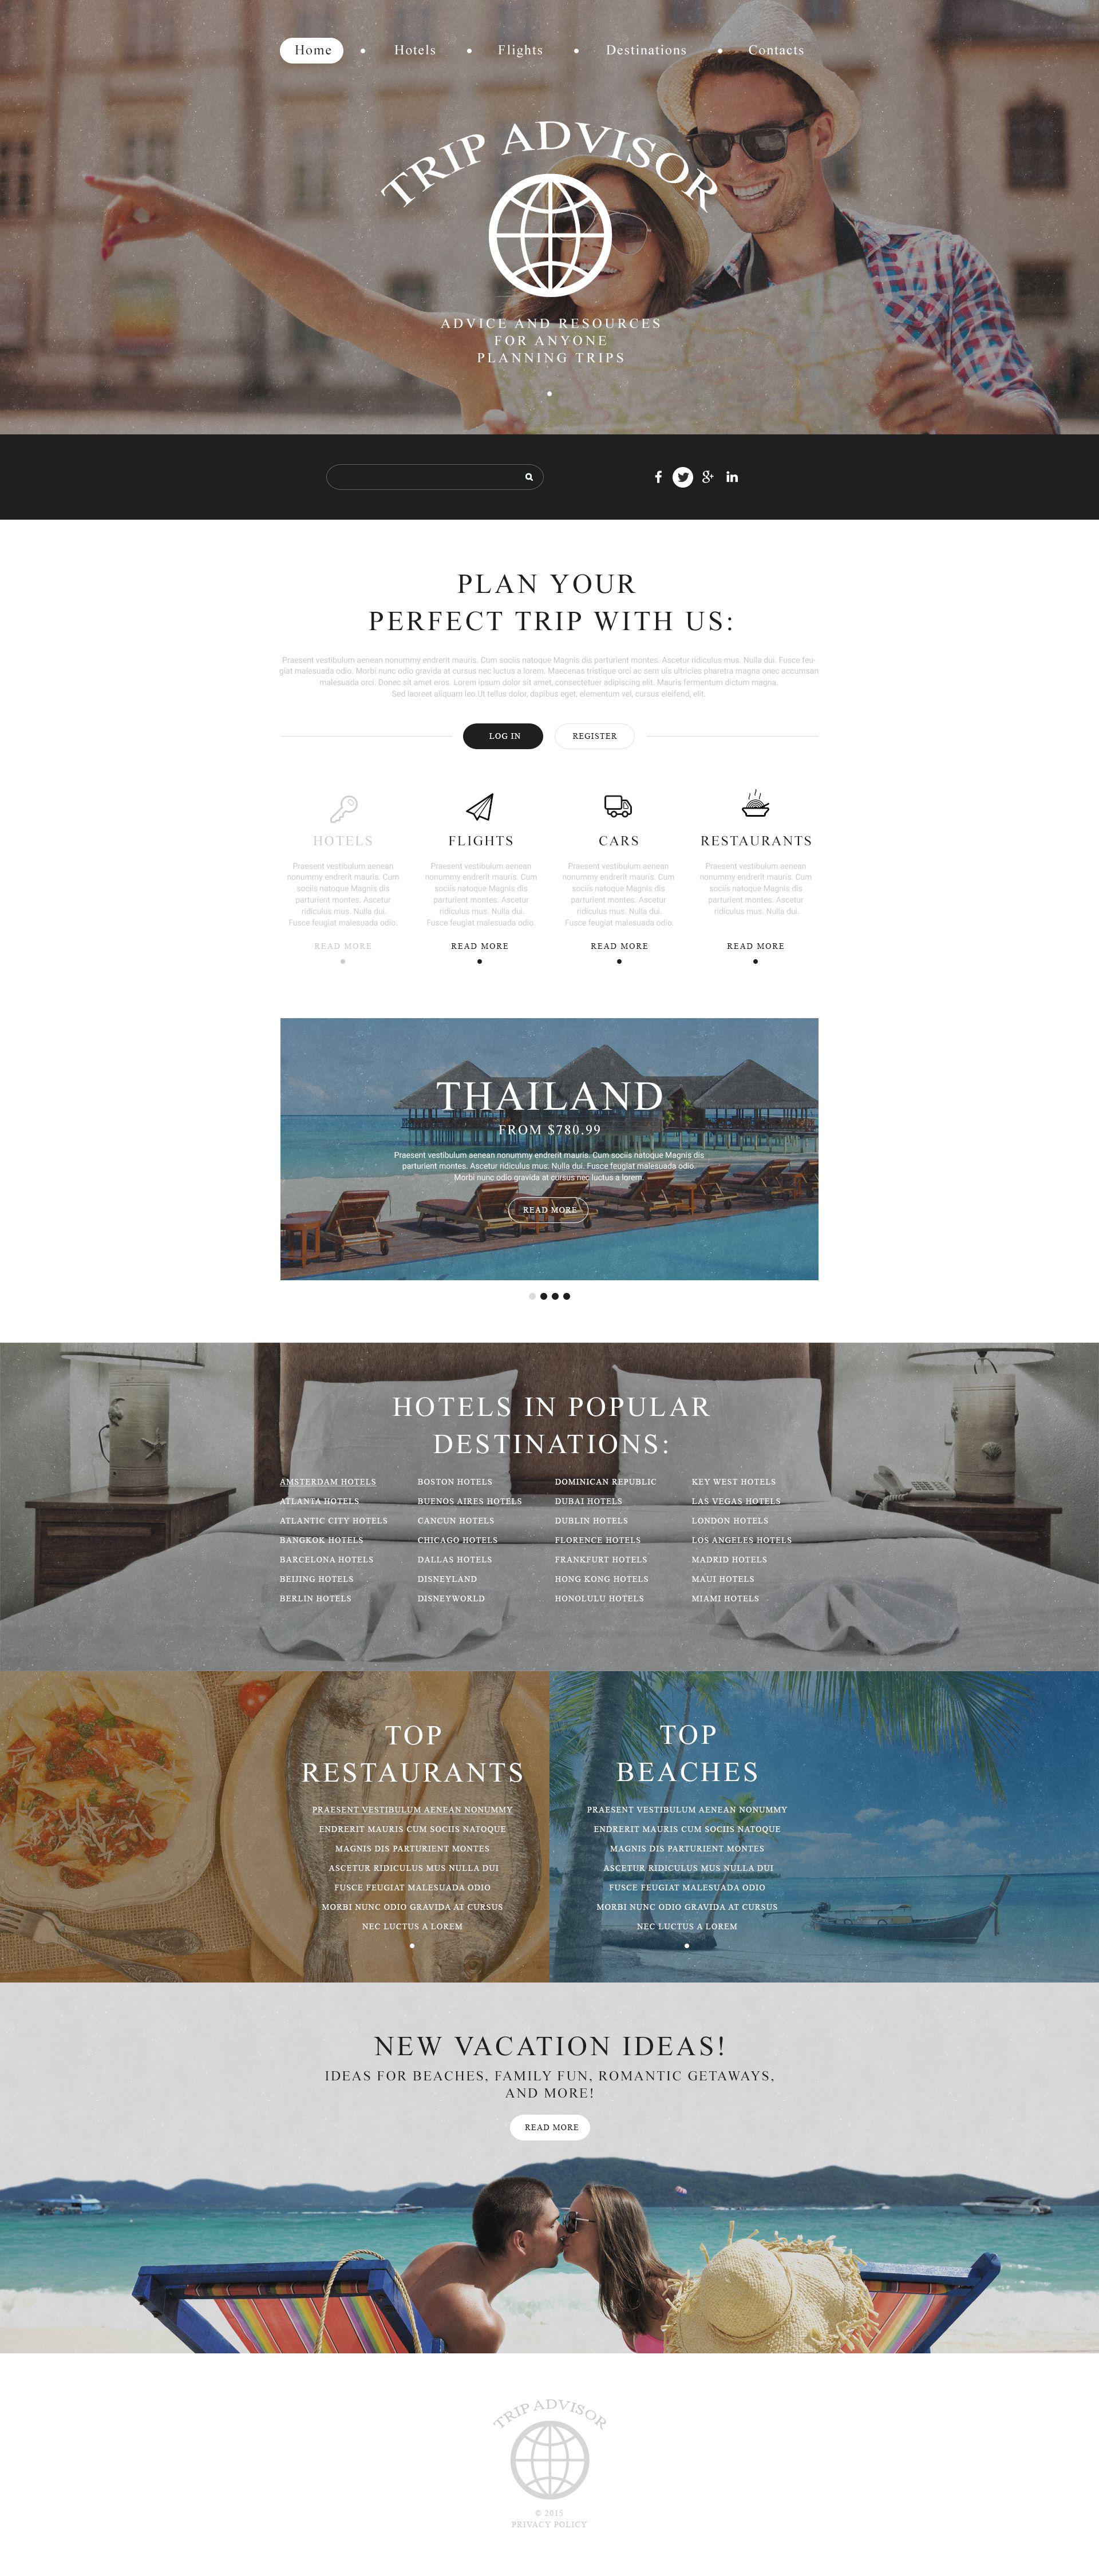 Trip Advisor Website Template